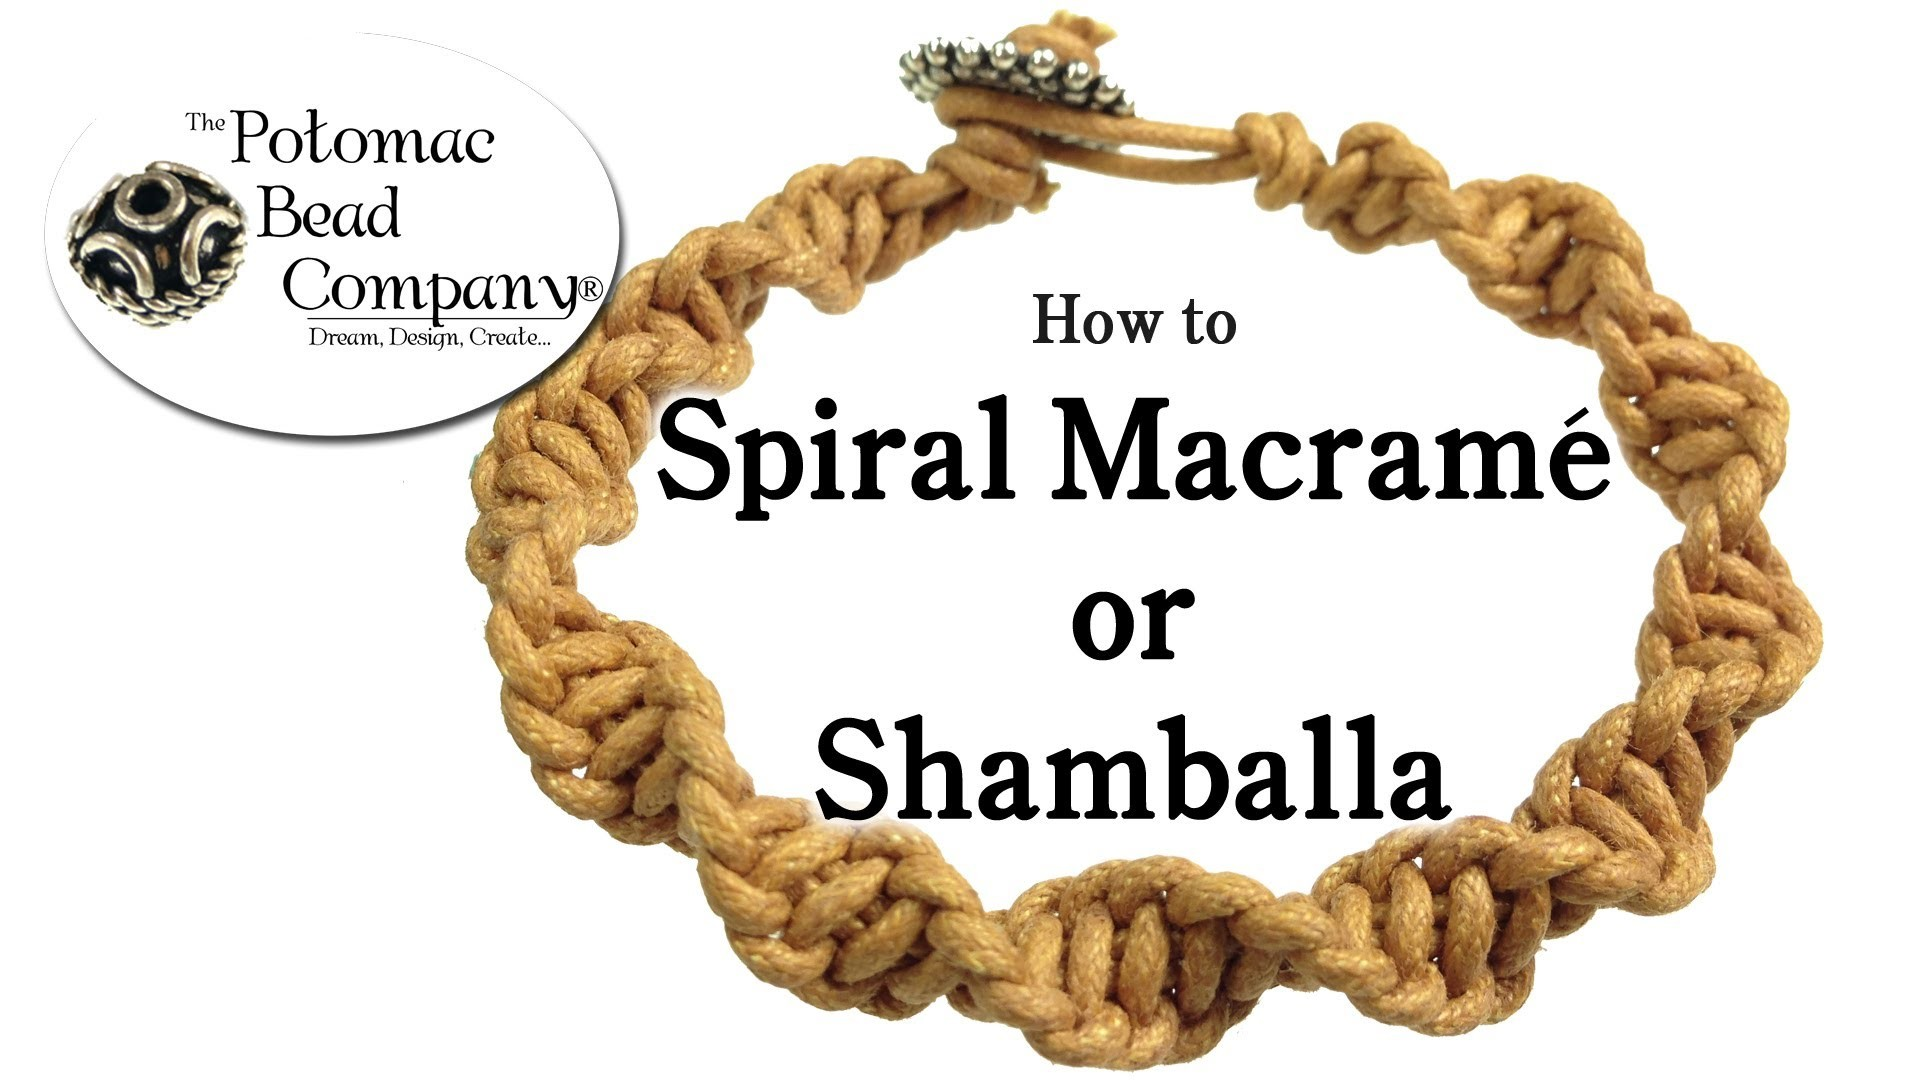 How to Spiral Macrame (Shamballa) Bracelet